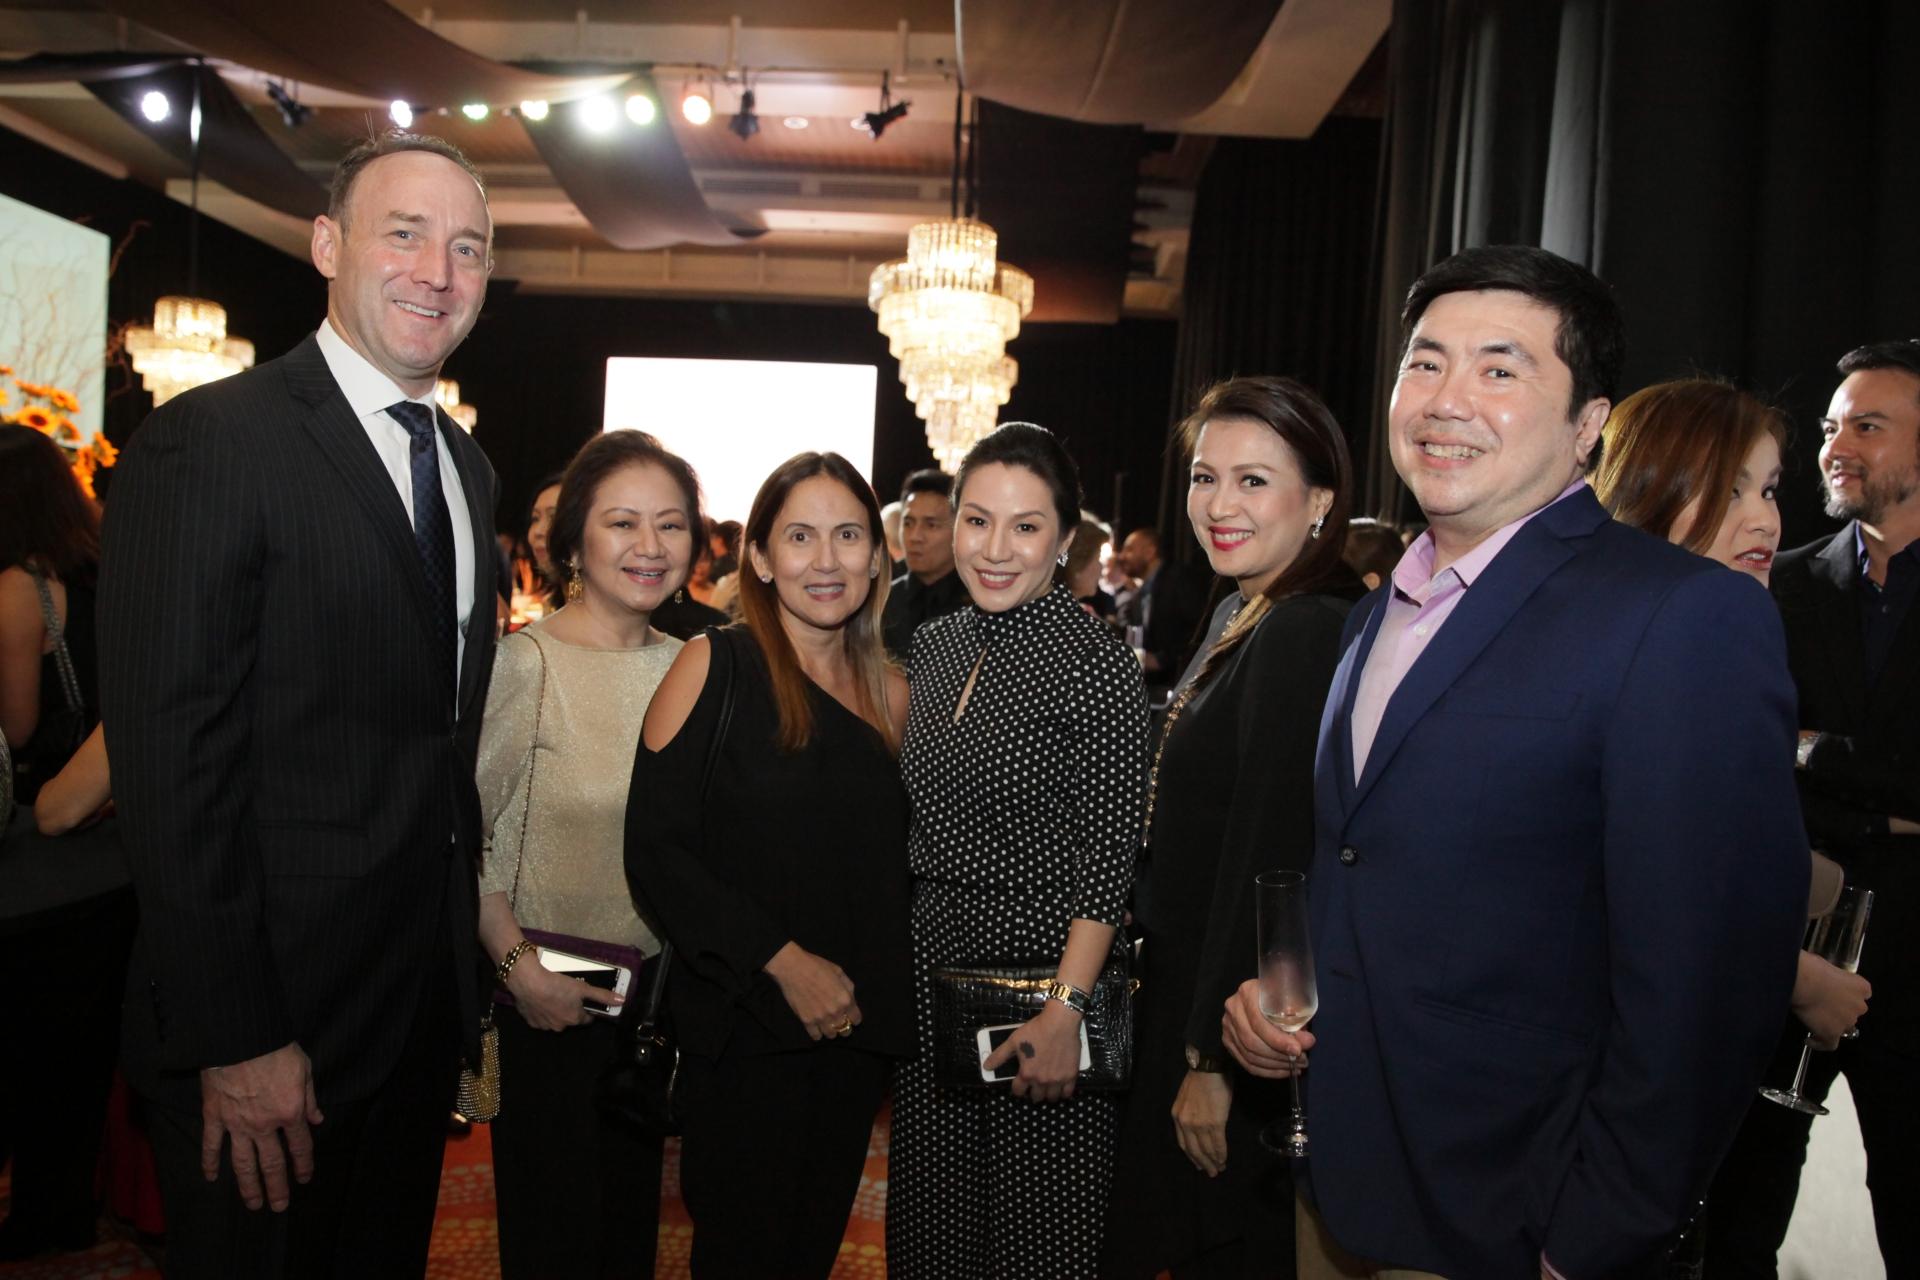 Geof Andres, Charisse Chuidian, Marisol Ramirez, Ana de Ocampo, Michelle Tiangco and Jayjay de Ocampo